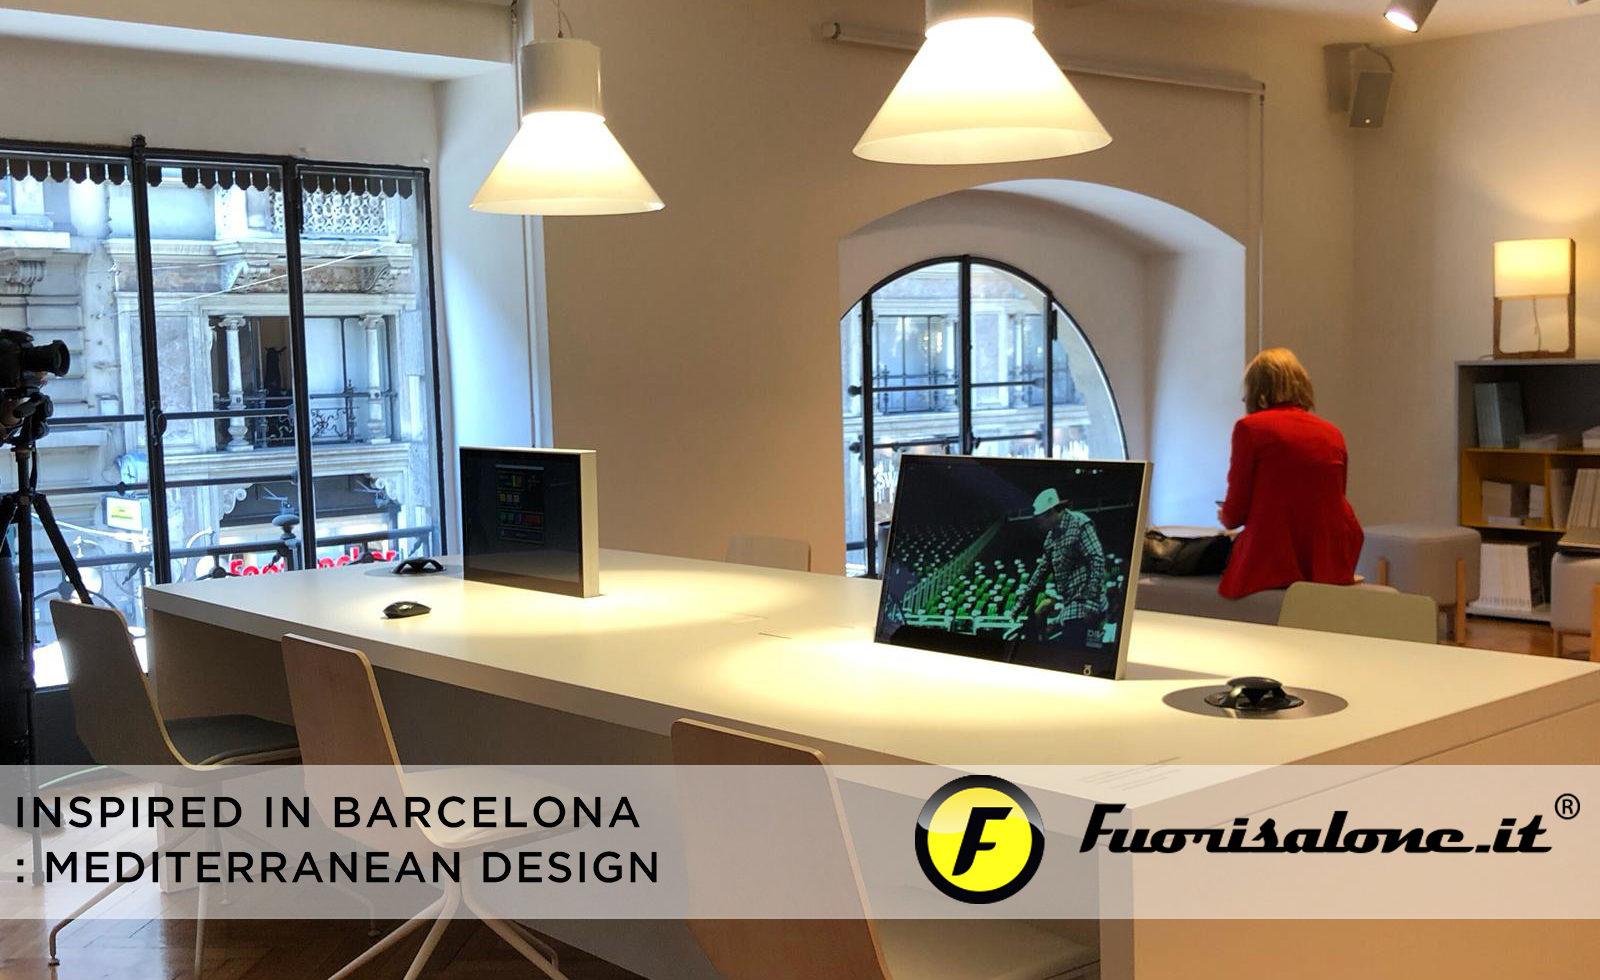 """Inspired in Barcelona: Mediterranean Design"", créativité des rythmes urbains et des couleurs"